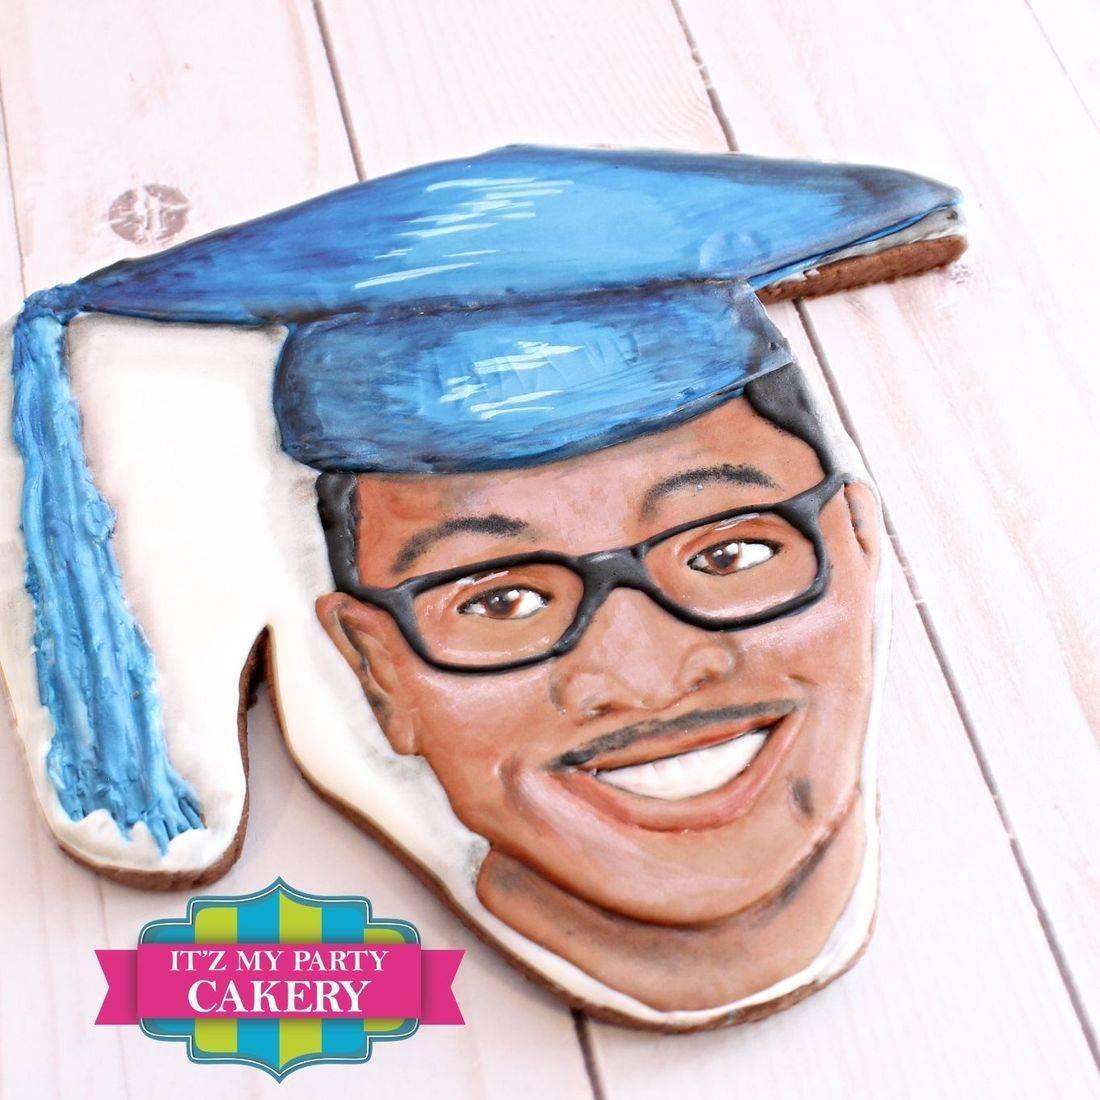 Portrait Cookies, Giant Face Cookies, Likeness Face Cookies, Custom Cookies, Itz My Party Cakery